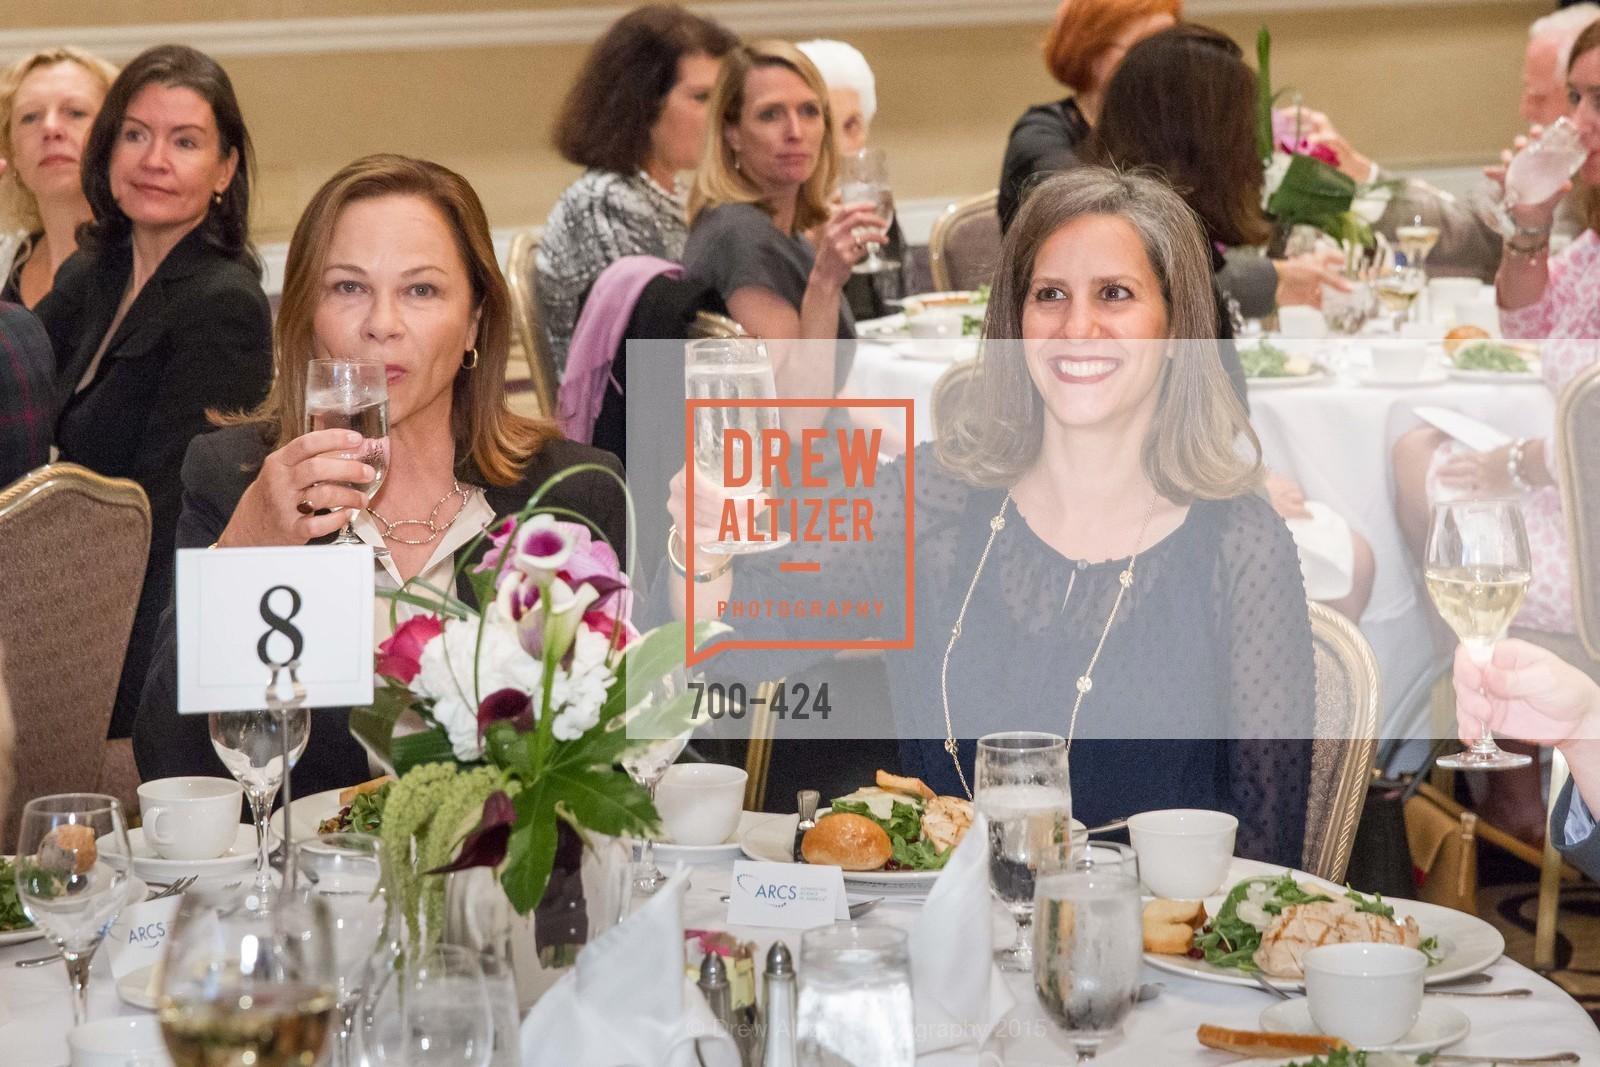 Gabrielle Kivitz, 2015 ARCS Foundation Scholar Awards Luncheon, The Fairmont San Francisco. 950 Mason St, October 29th, 2015,Drew Altizer, Drew Altizer Photography, full-service agency, private events, San Francisco photographer, photographer california